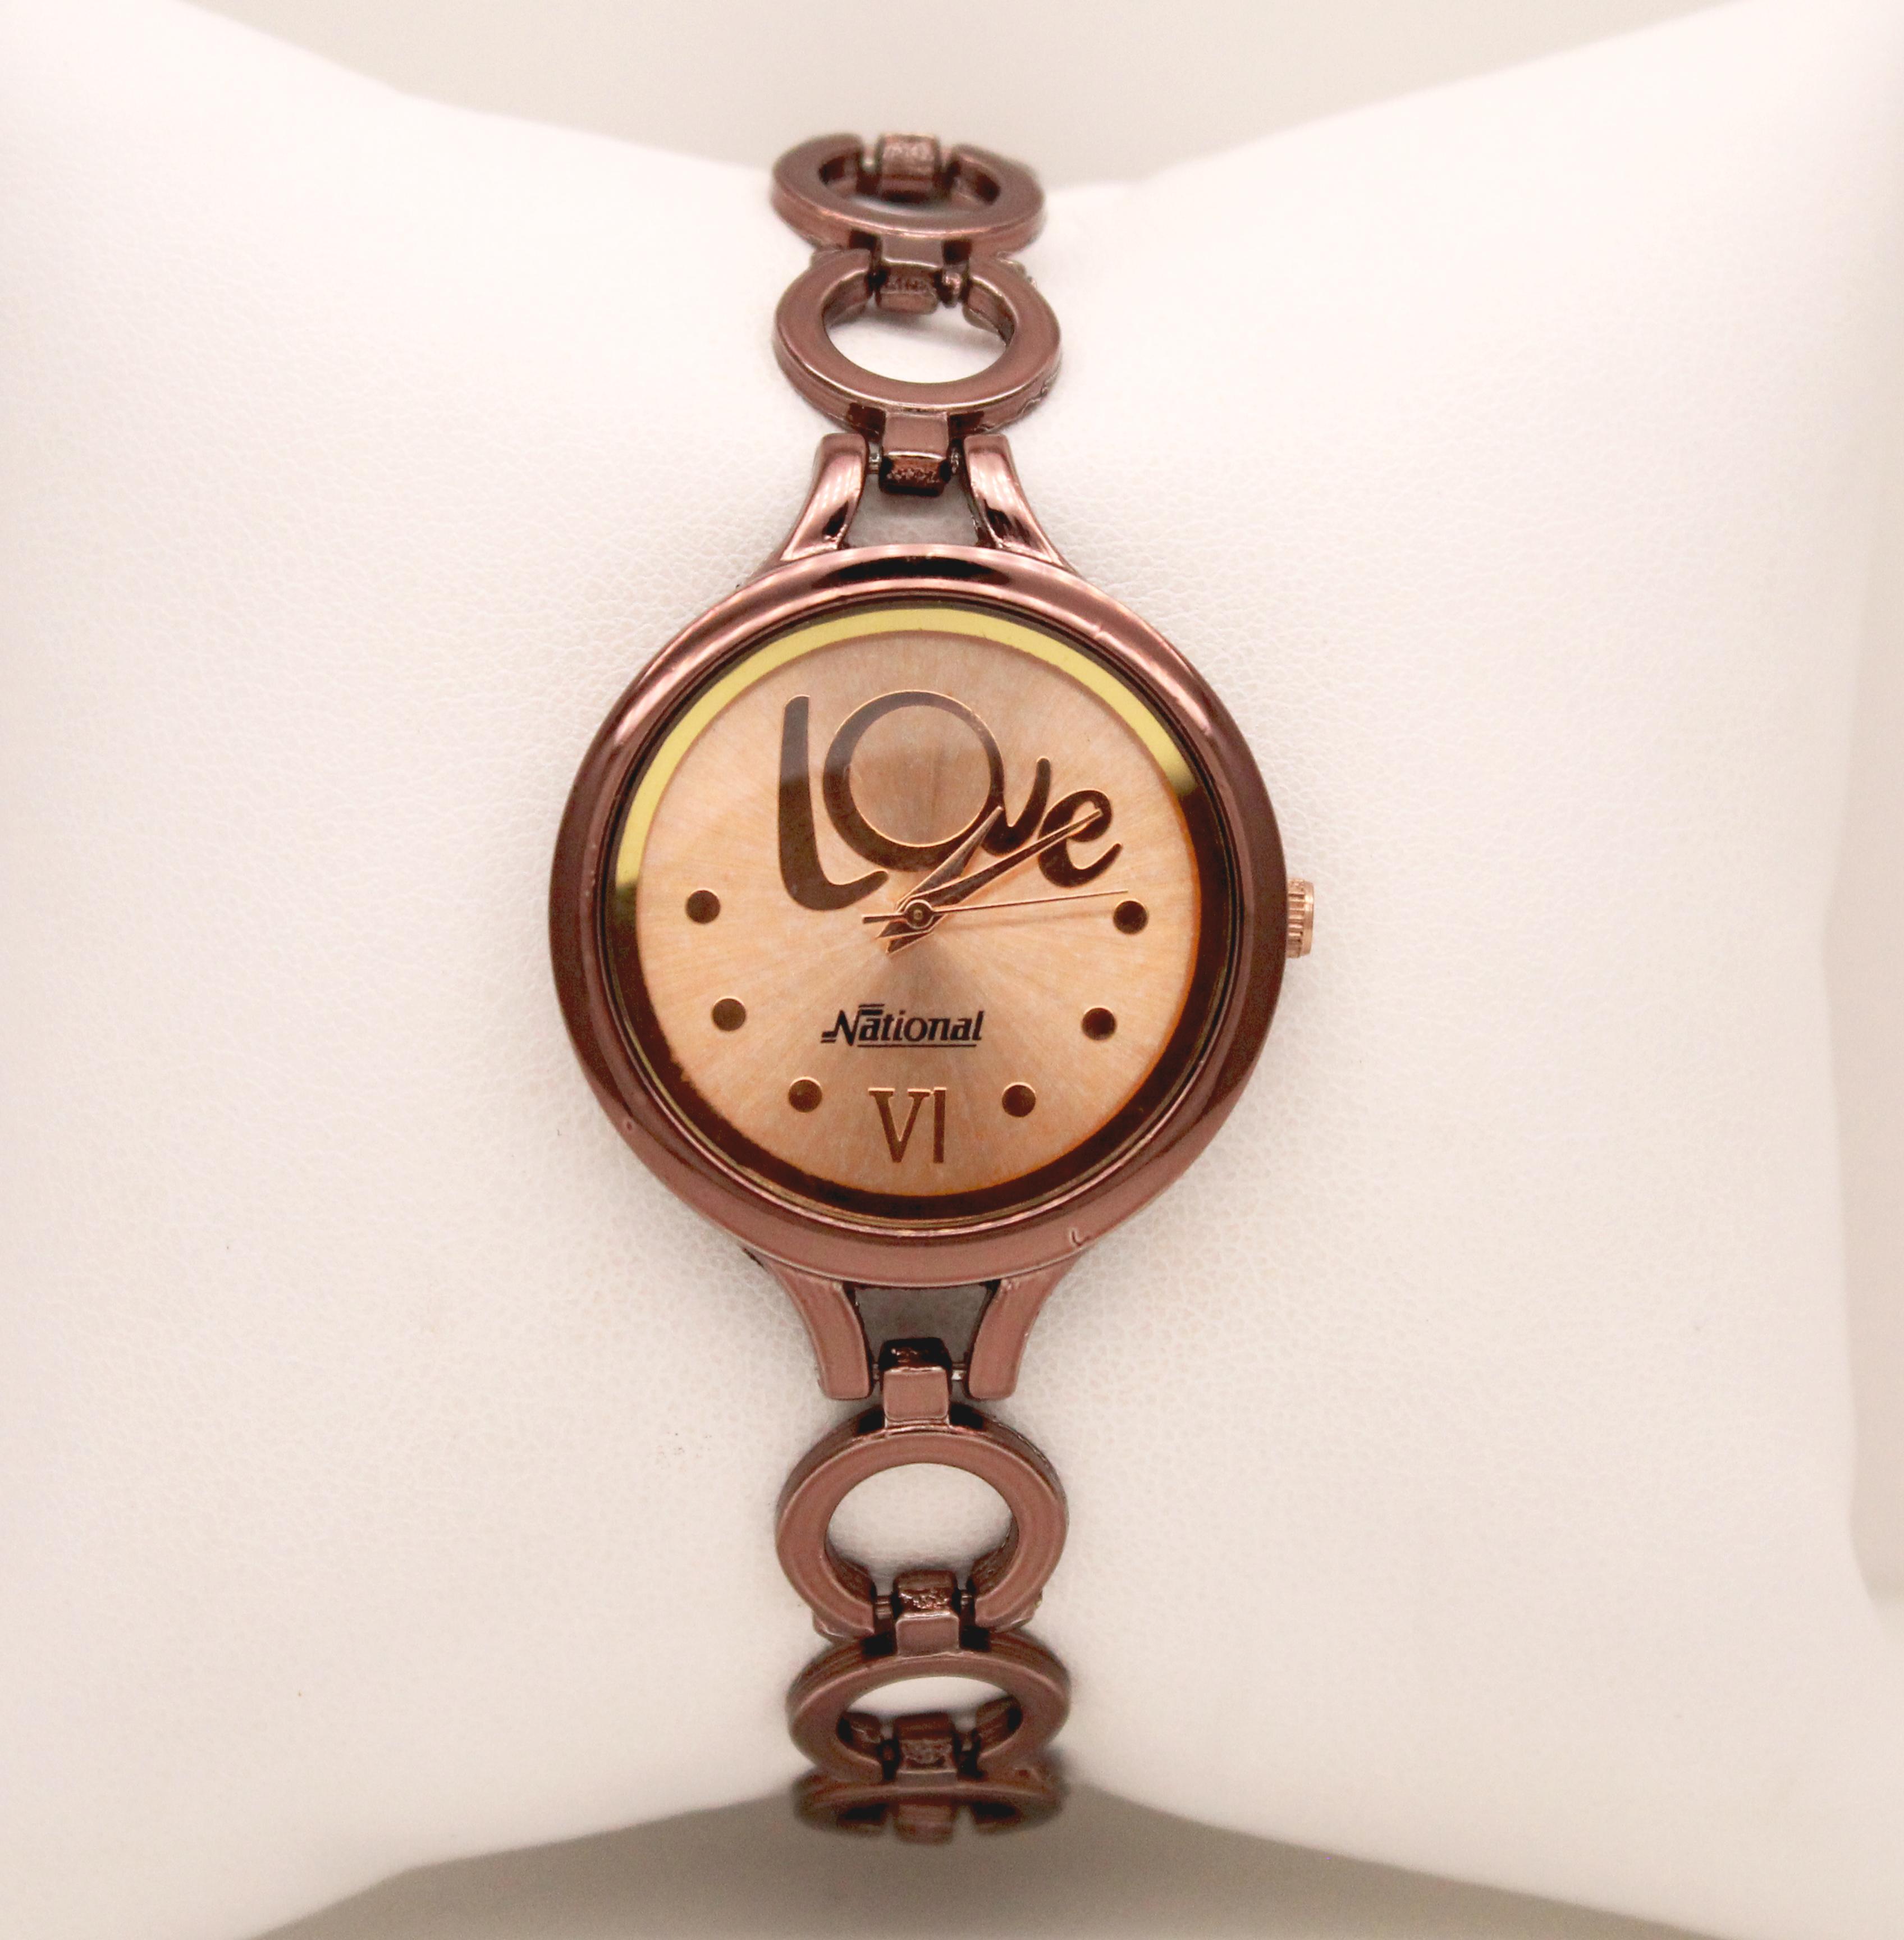 Classic rose gold wrist watch